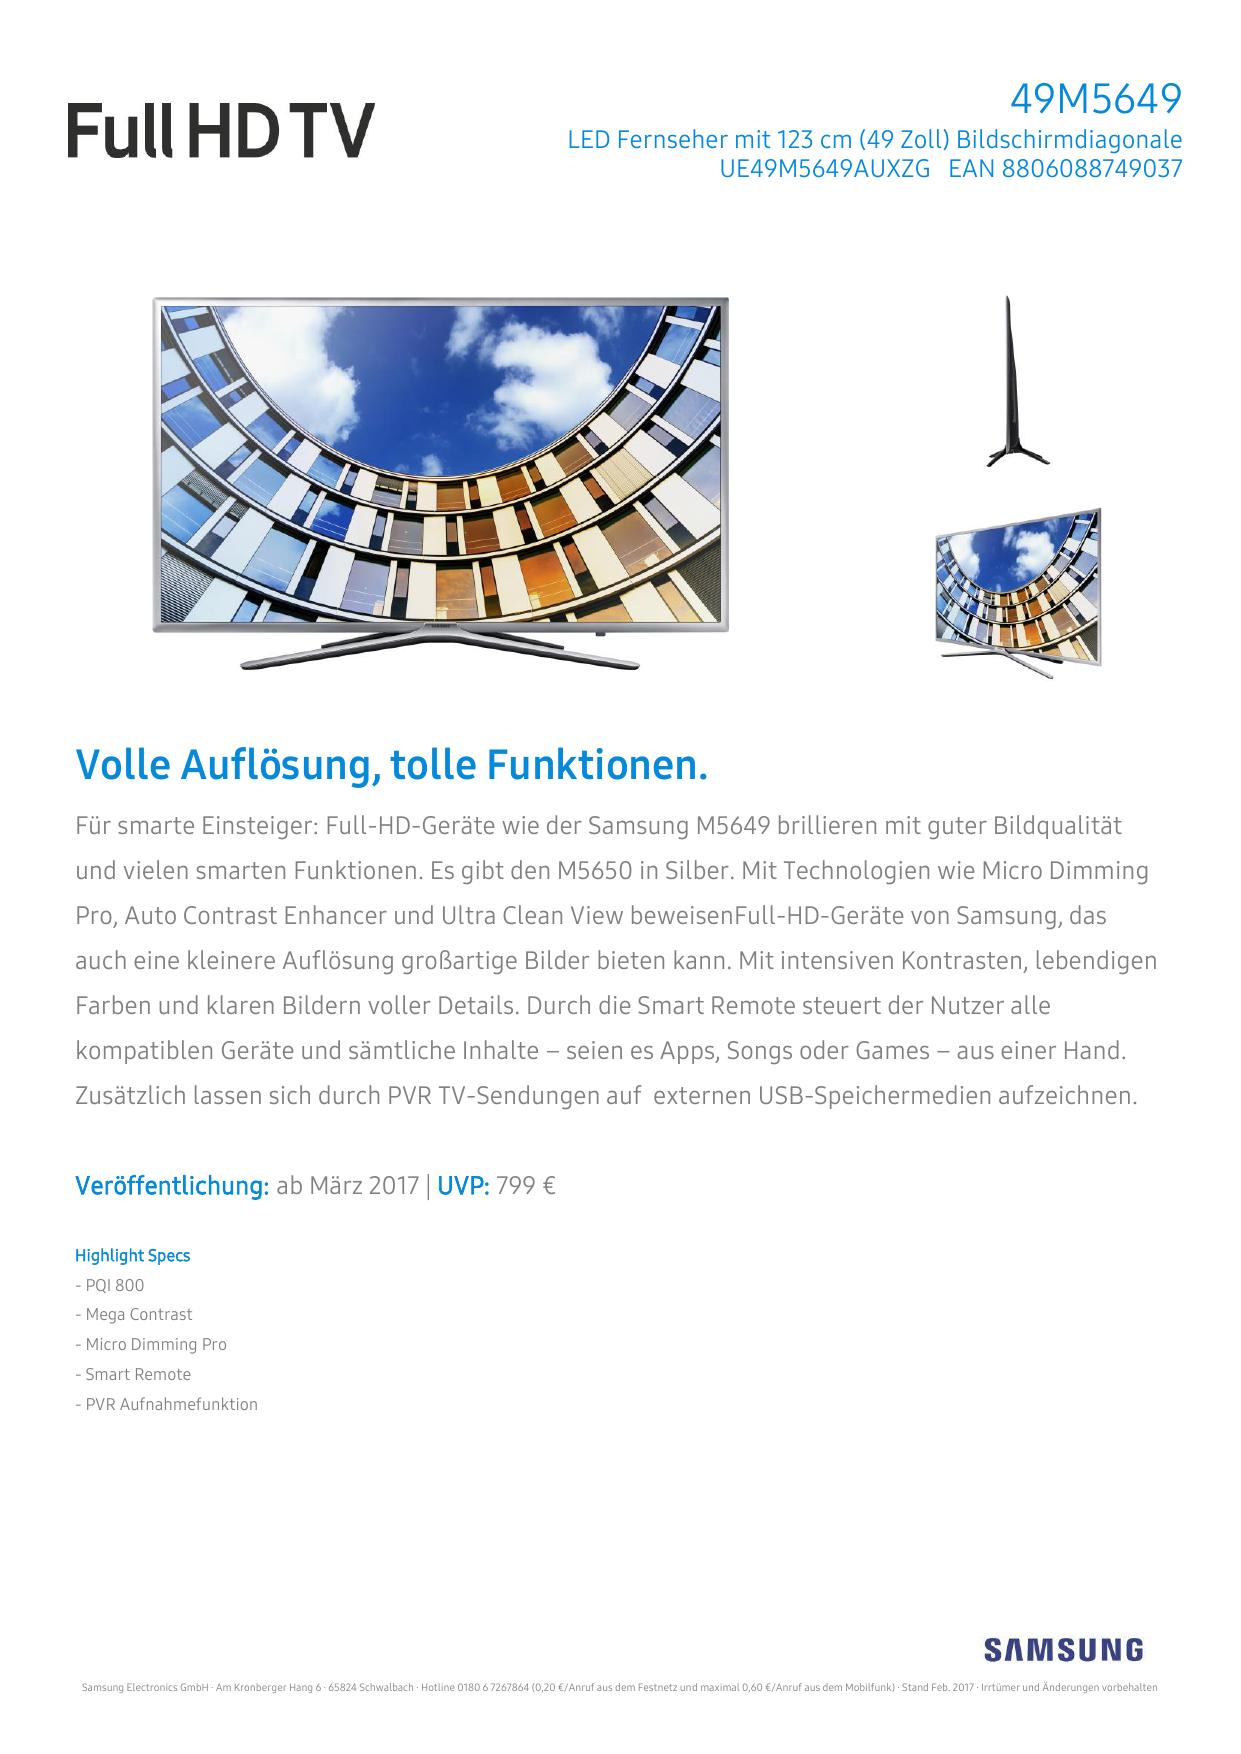 Samsung Ue49m5649 Hifi Im Hinterhof Manualzz Com